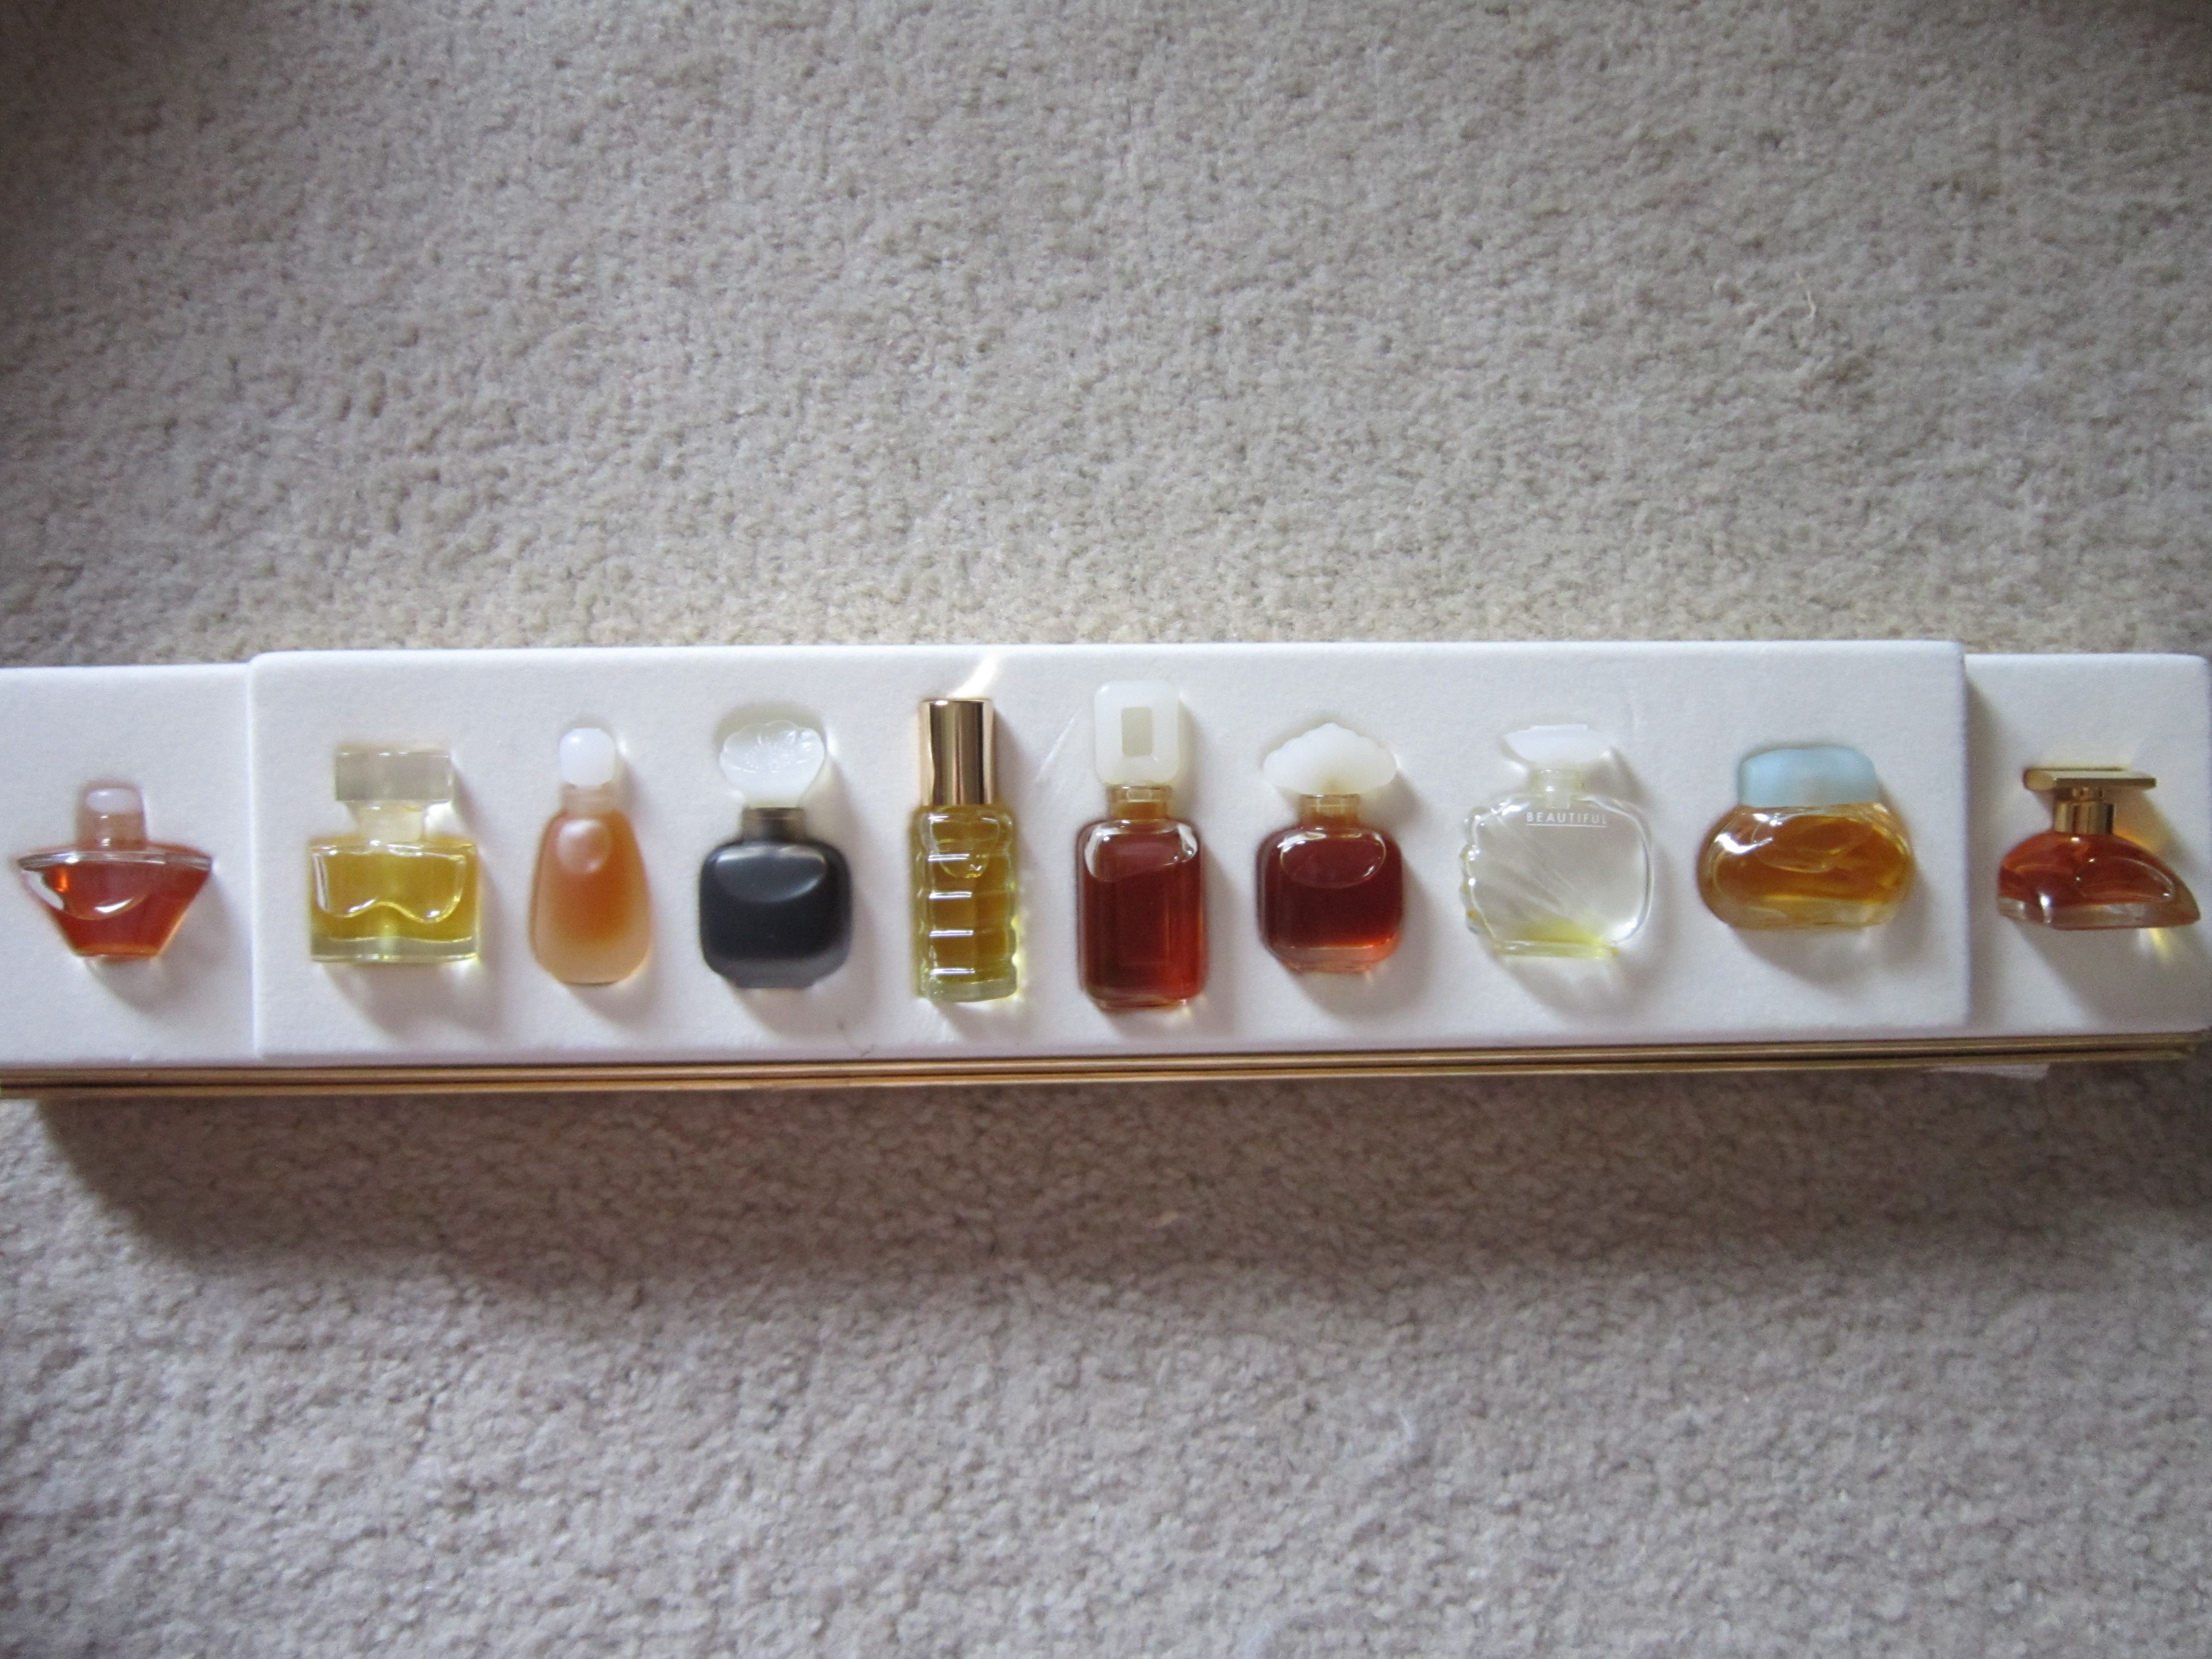 Miniature Perfume Bottles Estee Lauder Fragrance